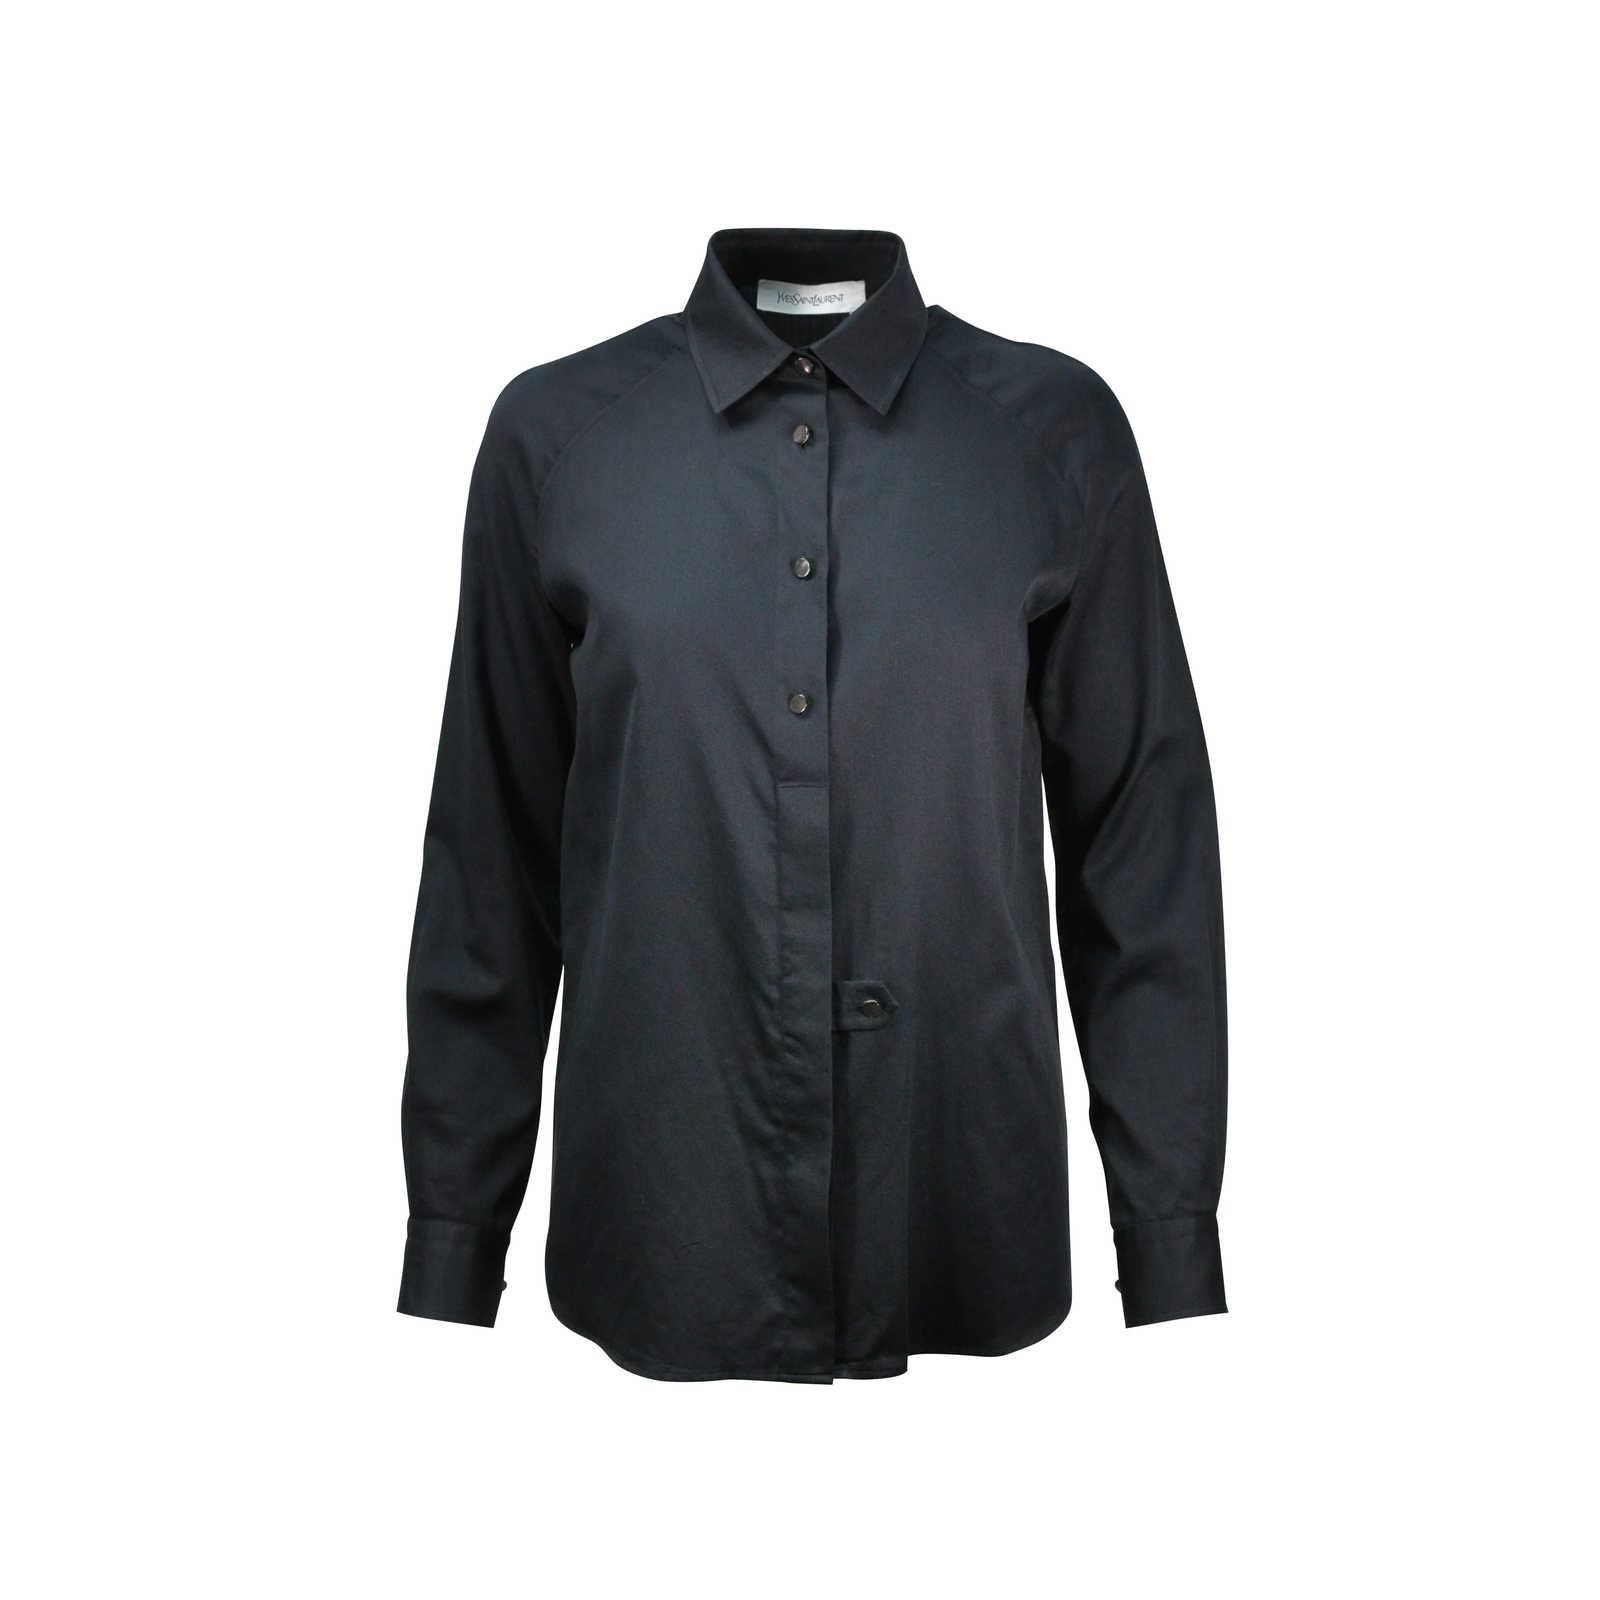 bed5e9c40c995 Authentic Second Hand Yves Saint Laurent Button Down Shirt (PSS-246-00206)  ...